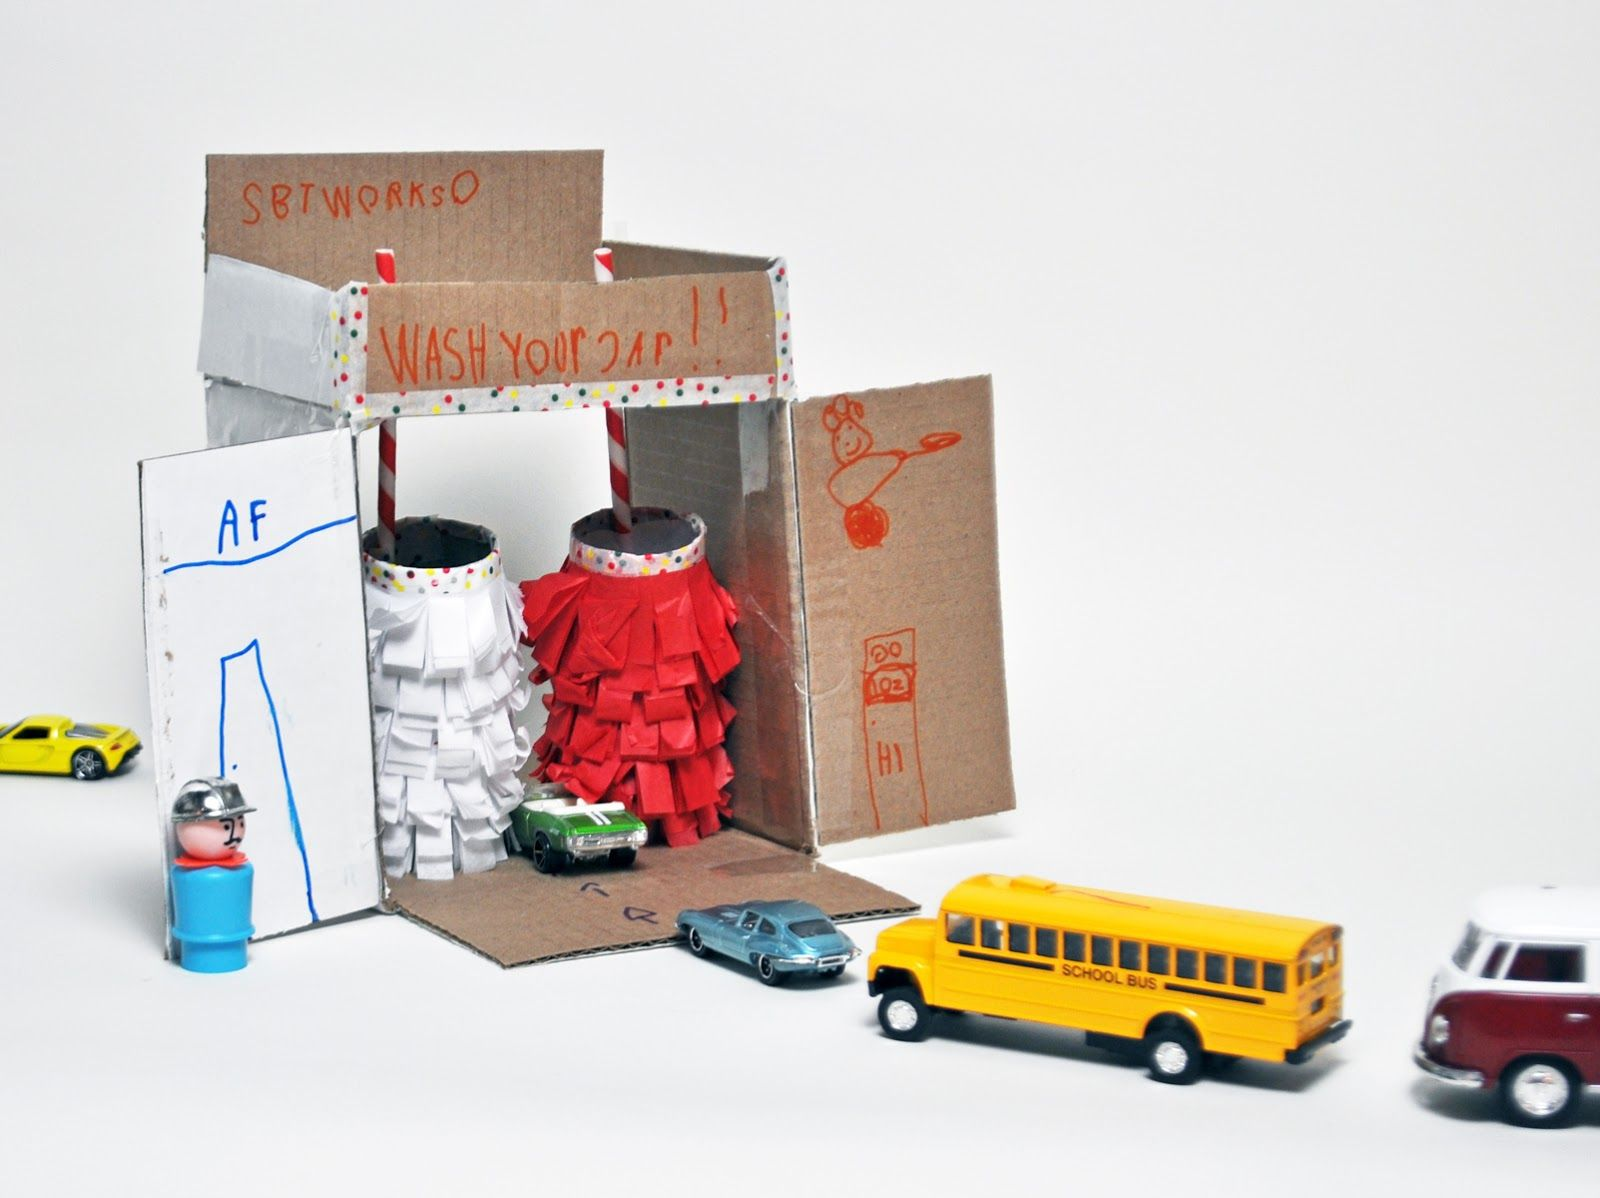 Diy cardboard car wash cardboard toy for kids diy crafts diy cardboard car wash cardboard toy for kids solutioingenieria Image collections